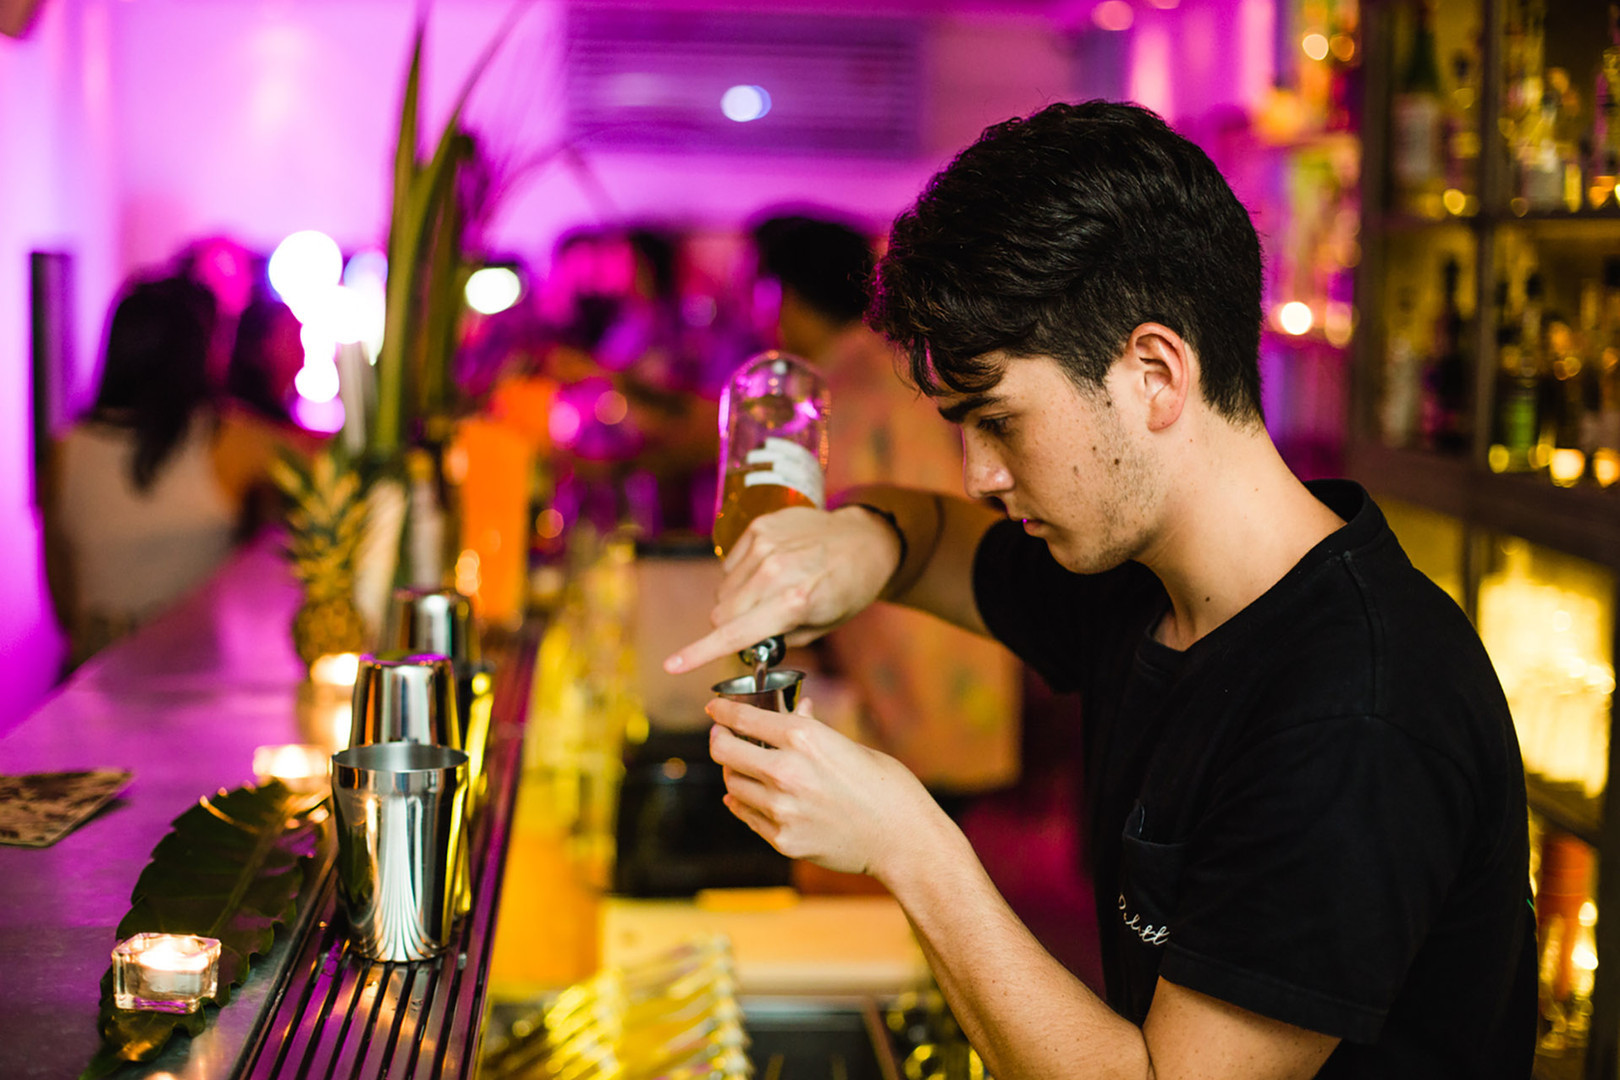 Tropic City Head Bartender - Arron